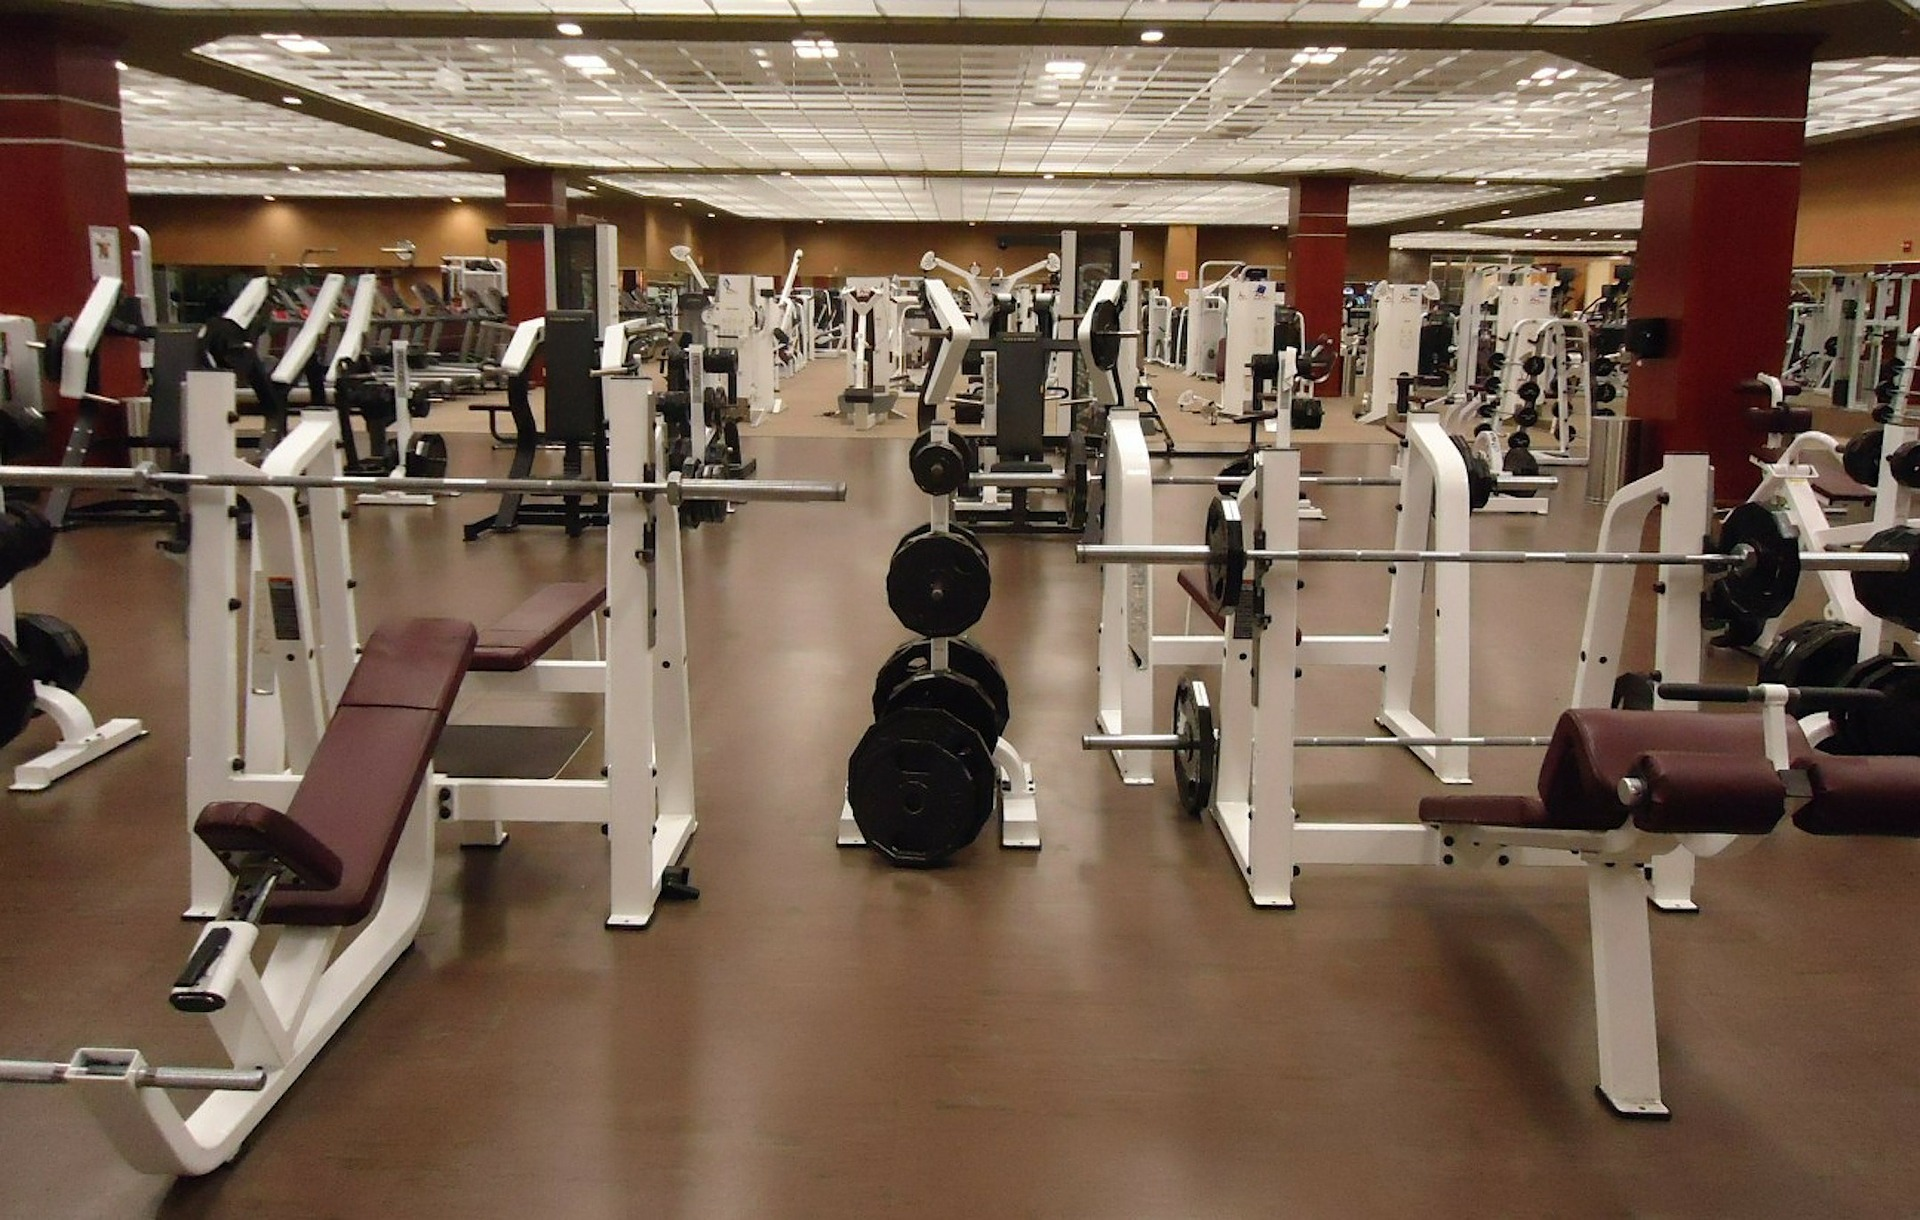 empty-gym-photo-of-machines